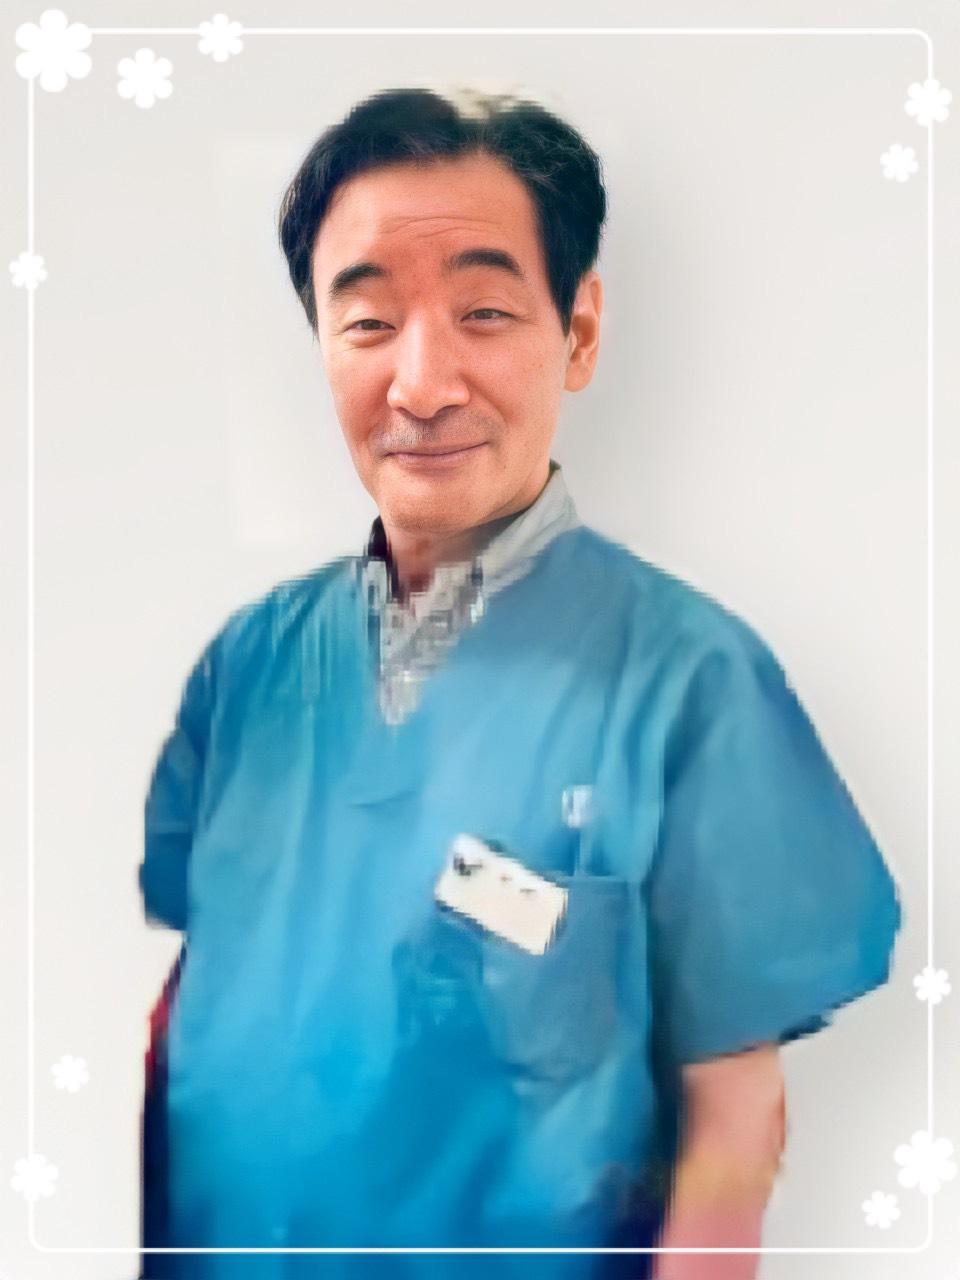 尼崎 アップル動物病院 院長 三浦克比古